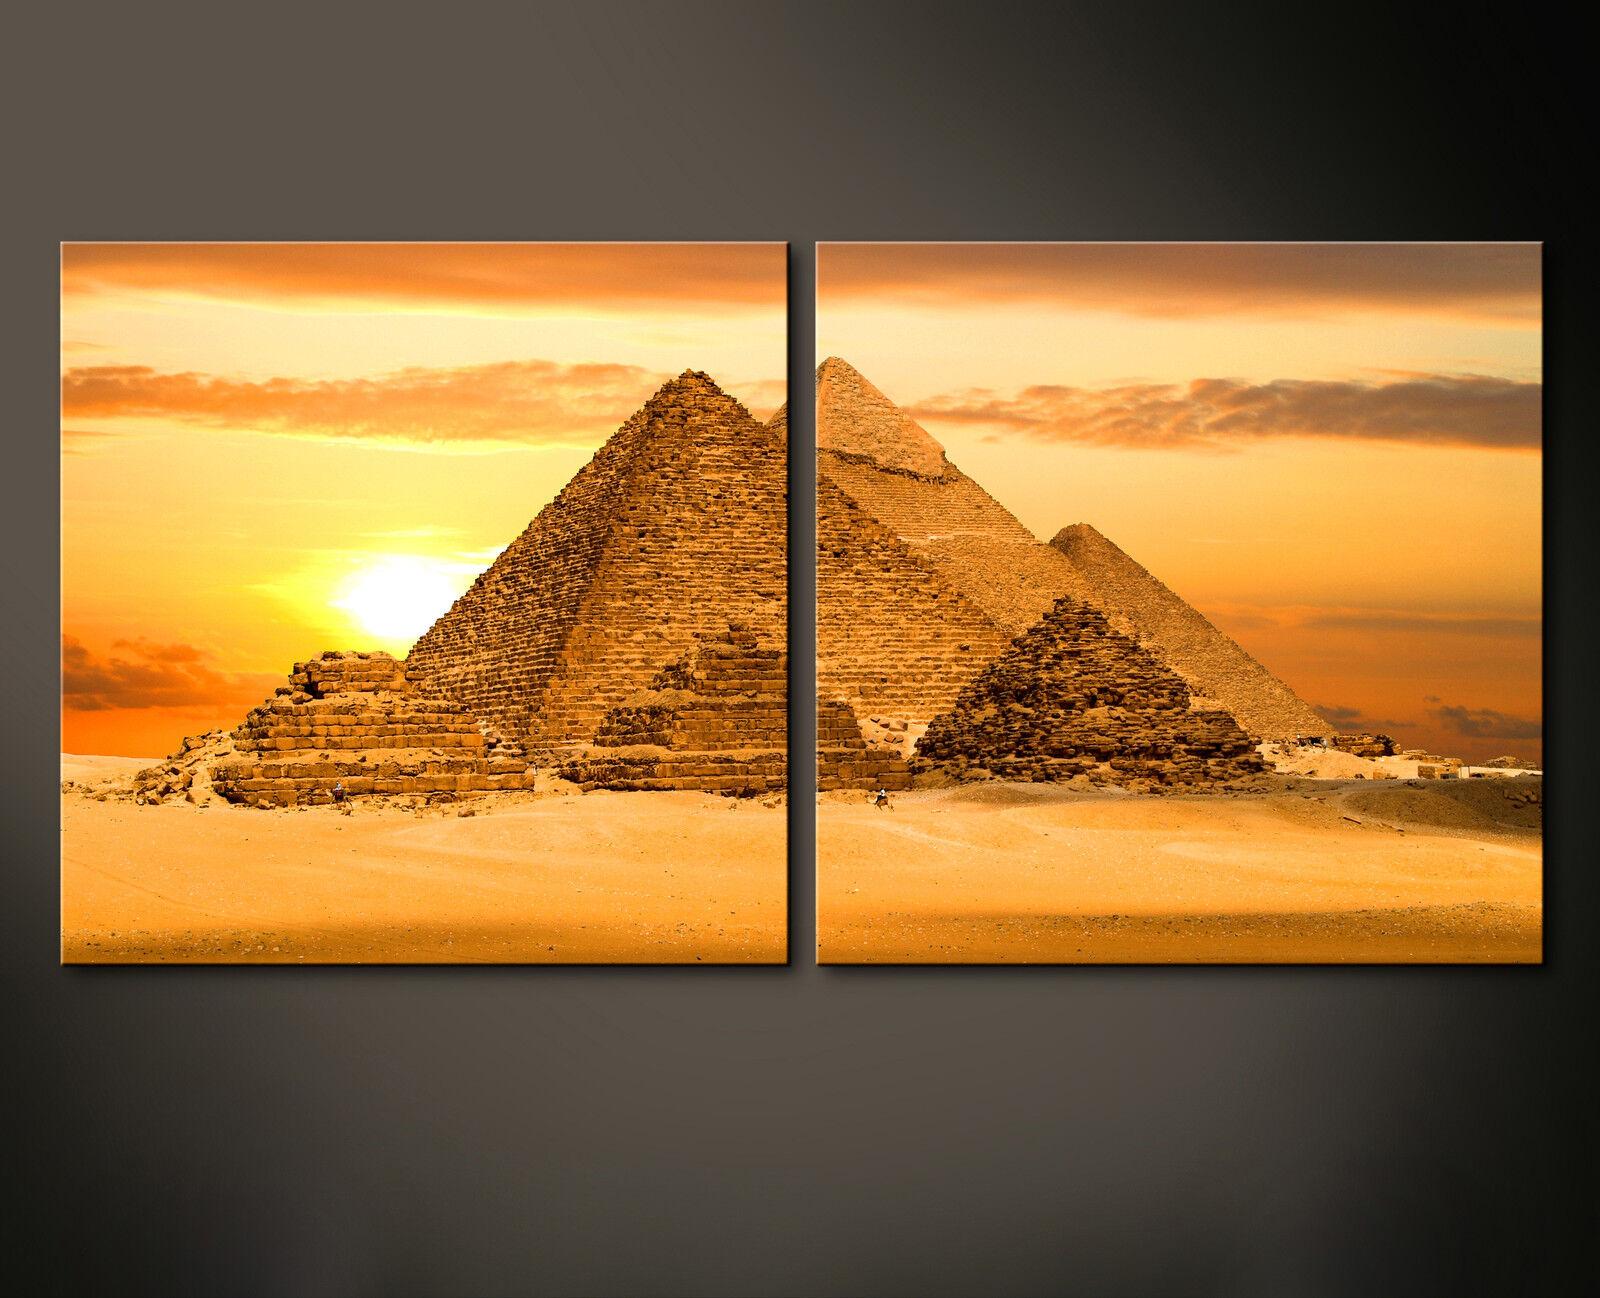 PYRAMIDS WALL Leinwand Bild Bilder Pyramiden Agypten Pharao Gizeh Orange XL Deko